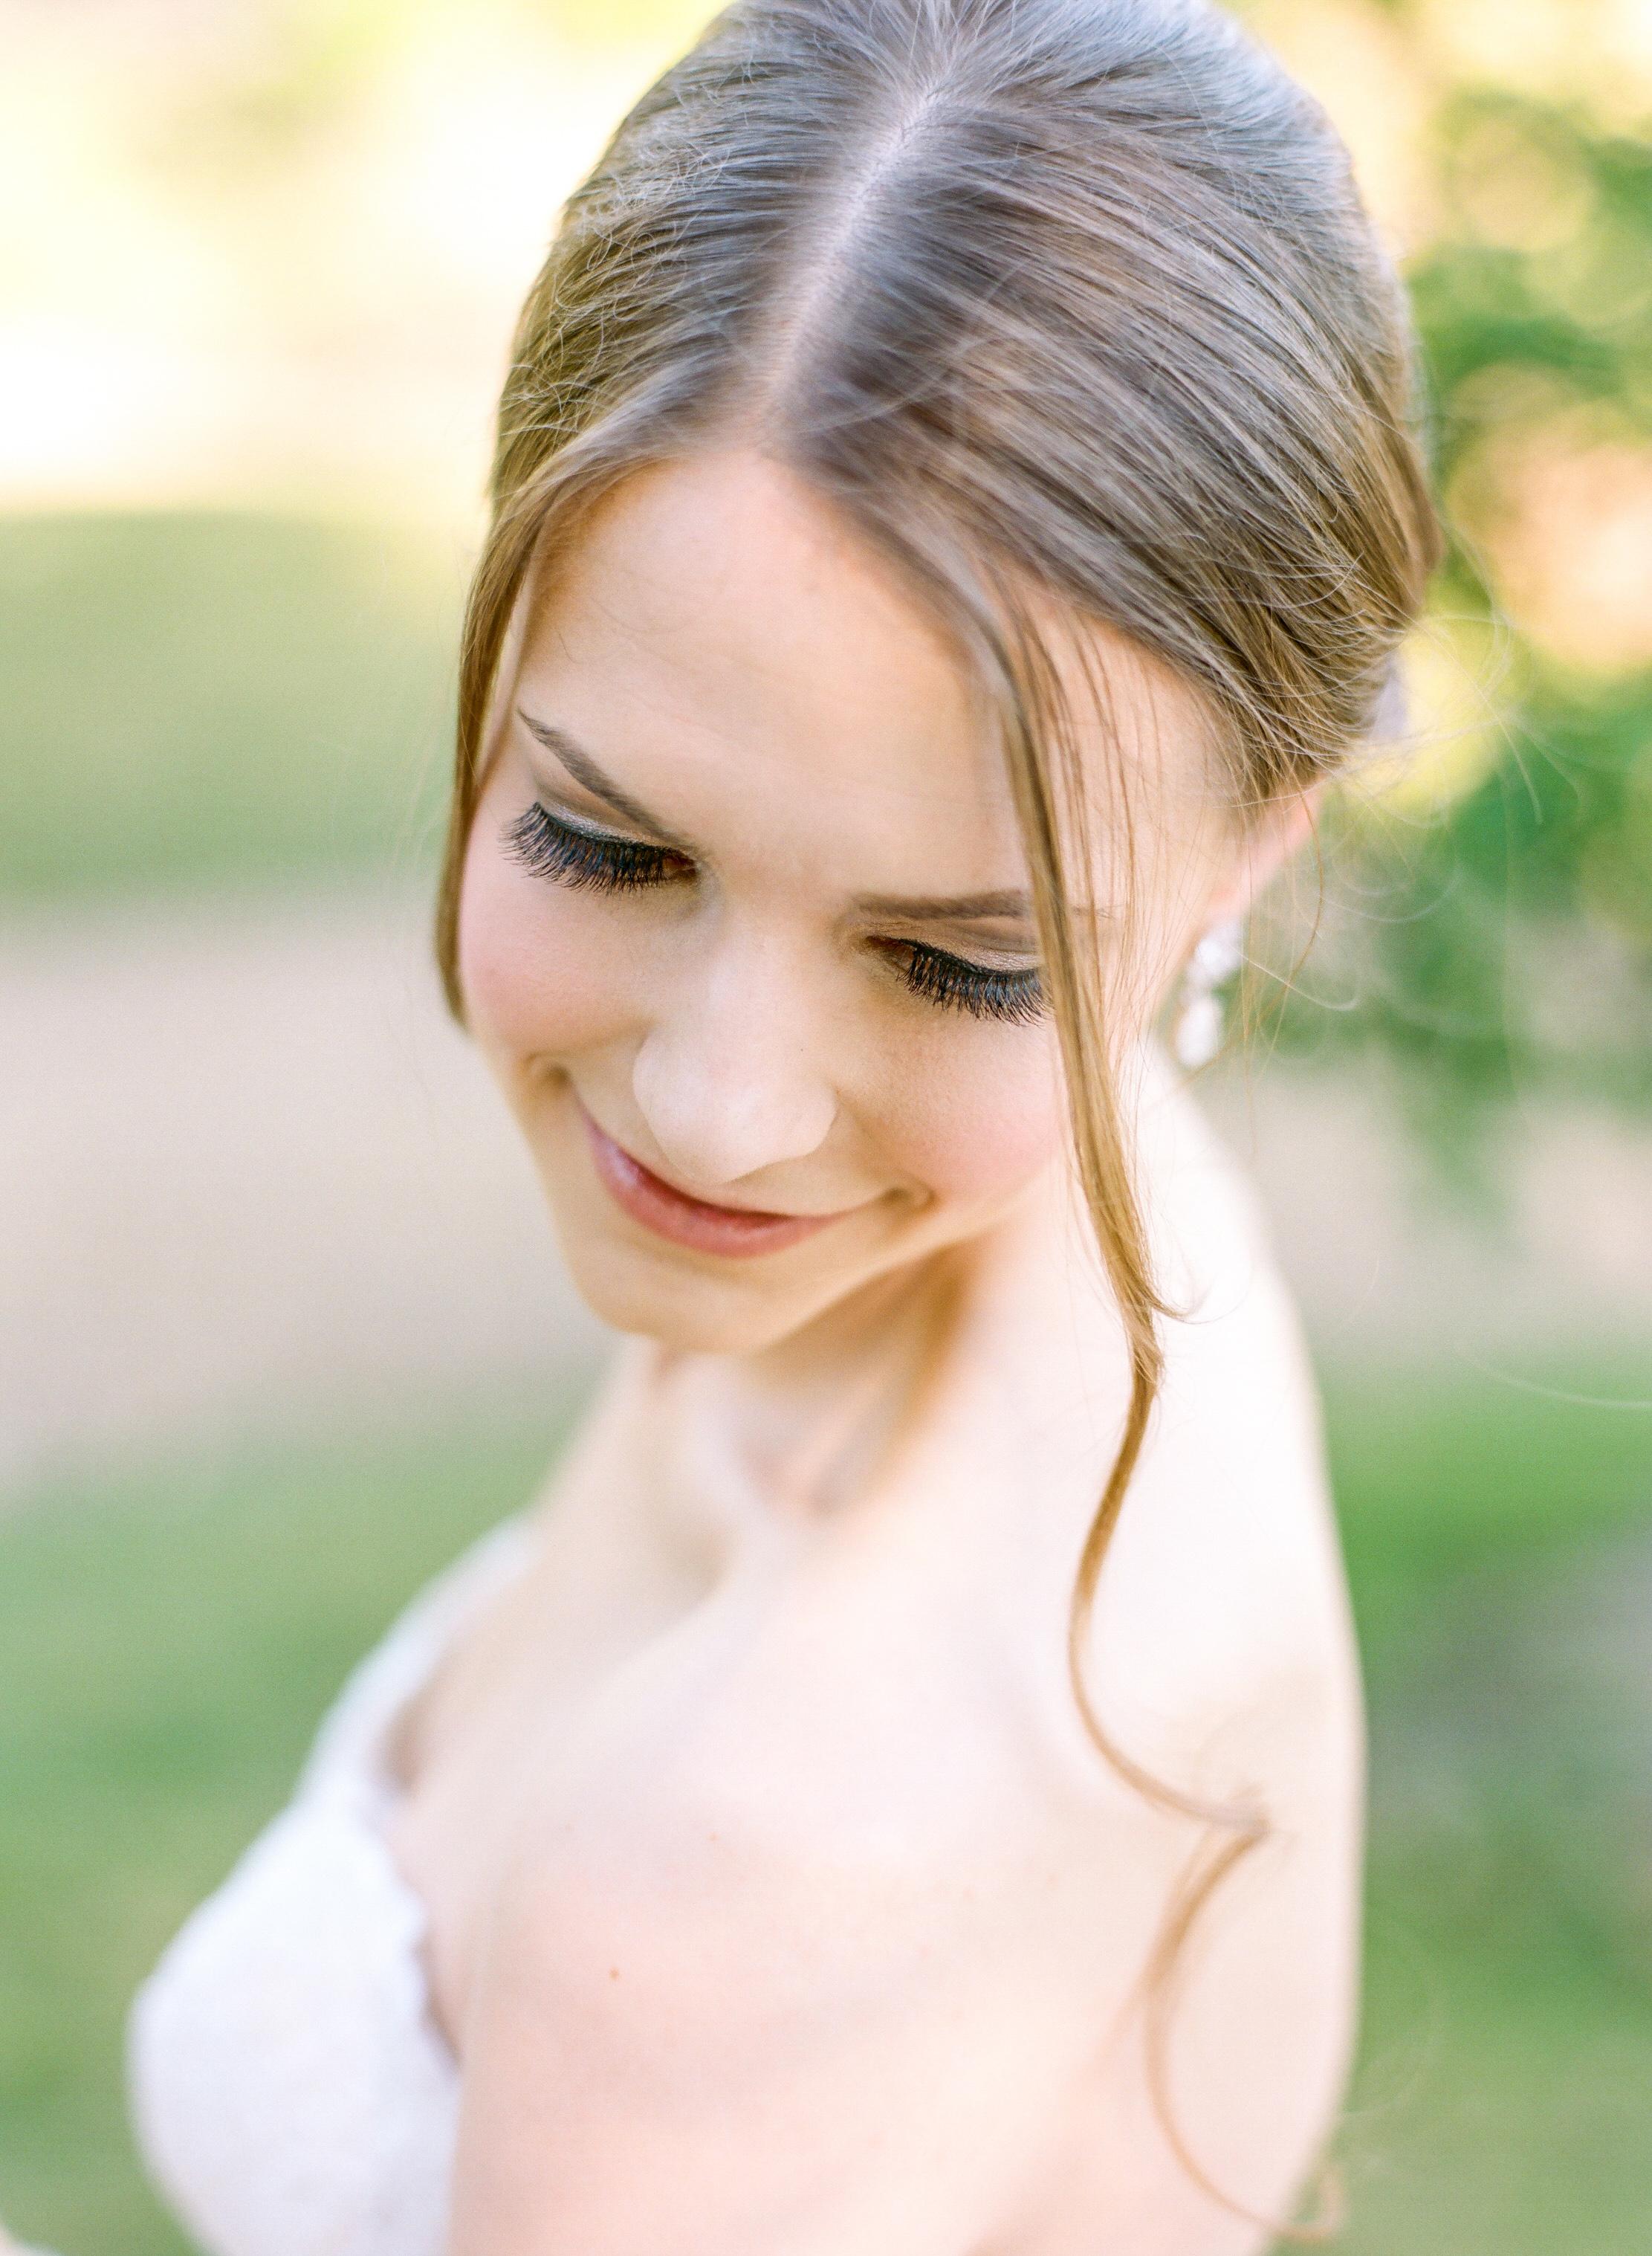 Houston-Wedding-Photographer-Film-Fine-Art-Bridals-Dana Fernandez-Photography-4.jpg